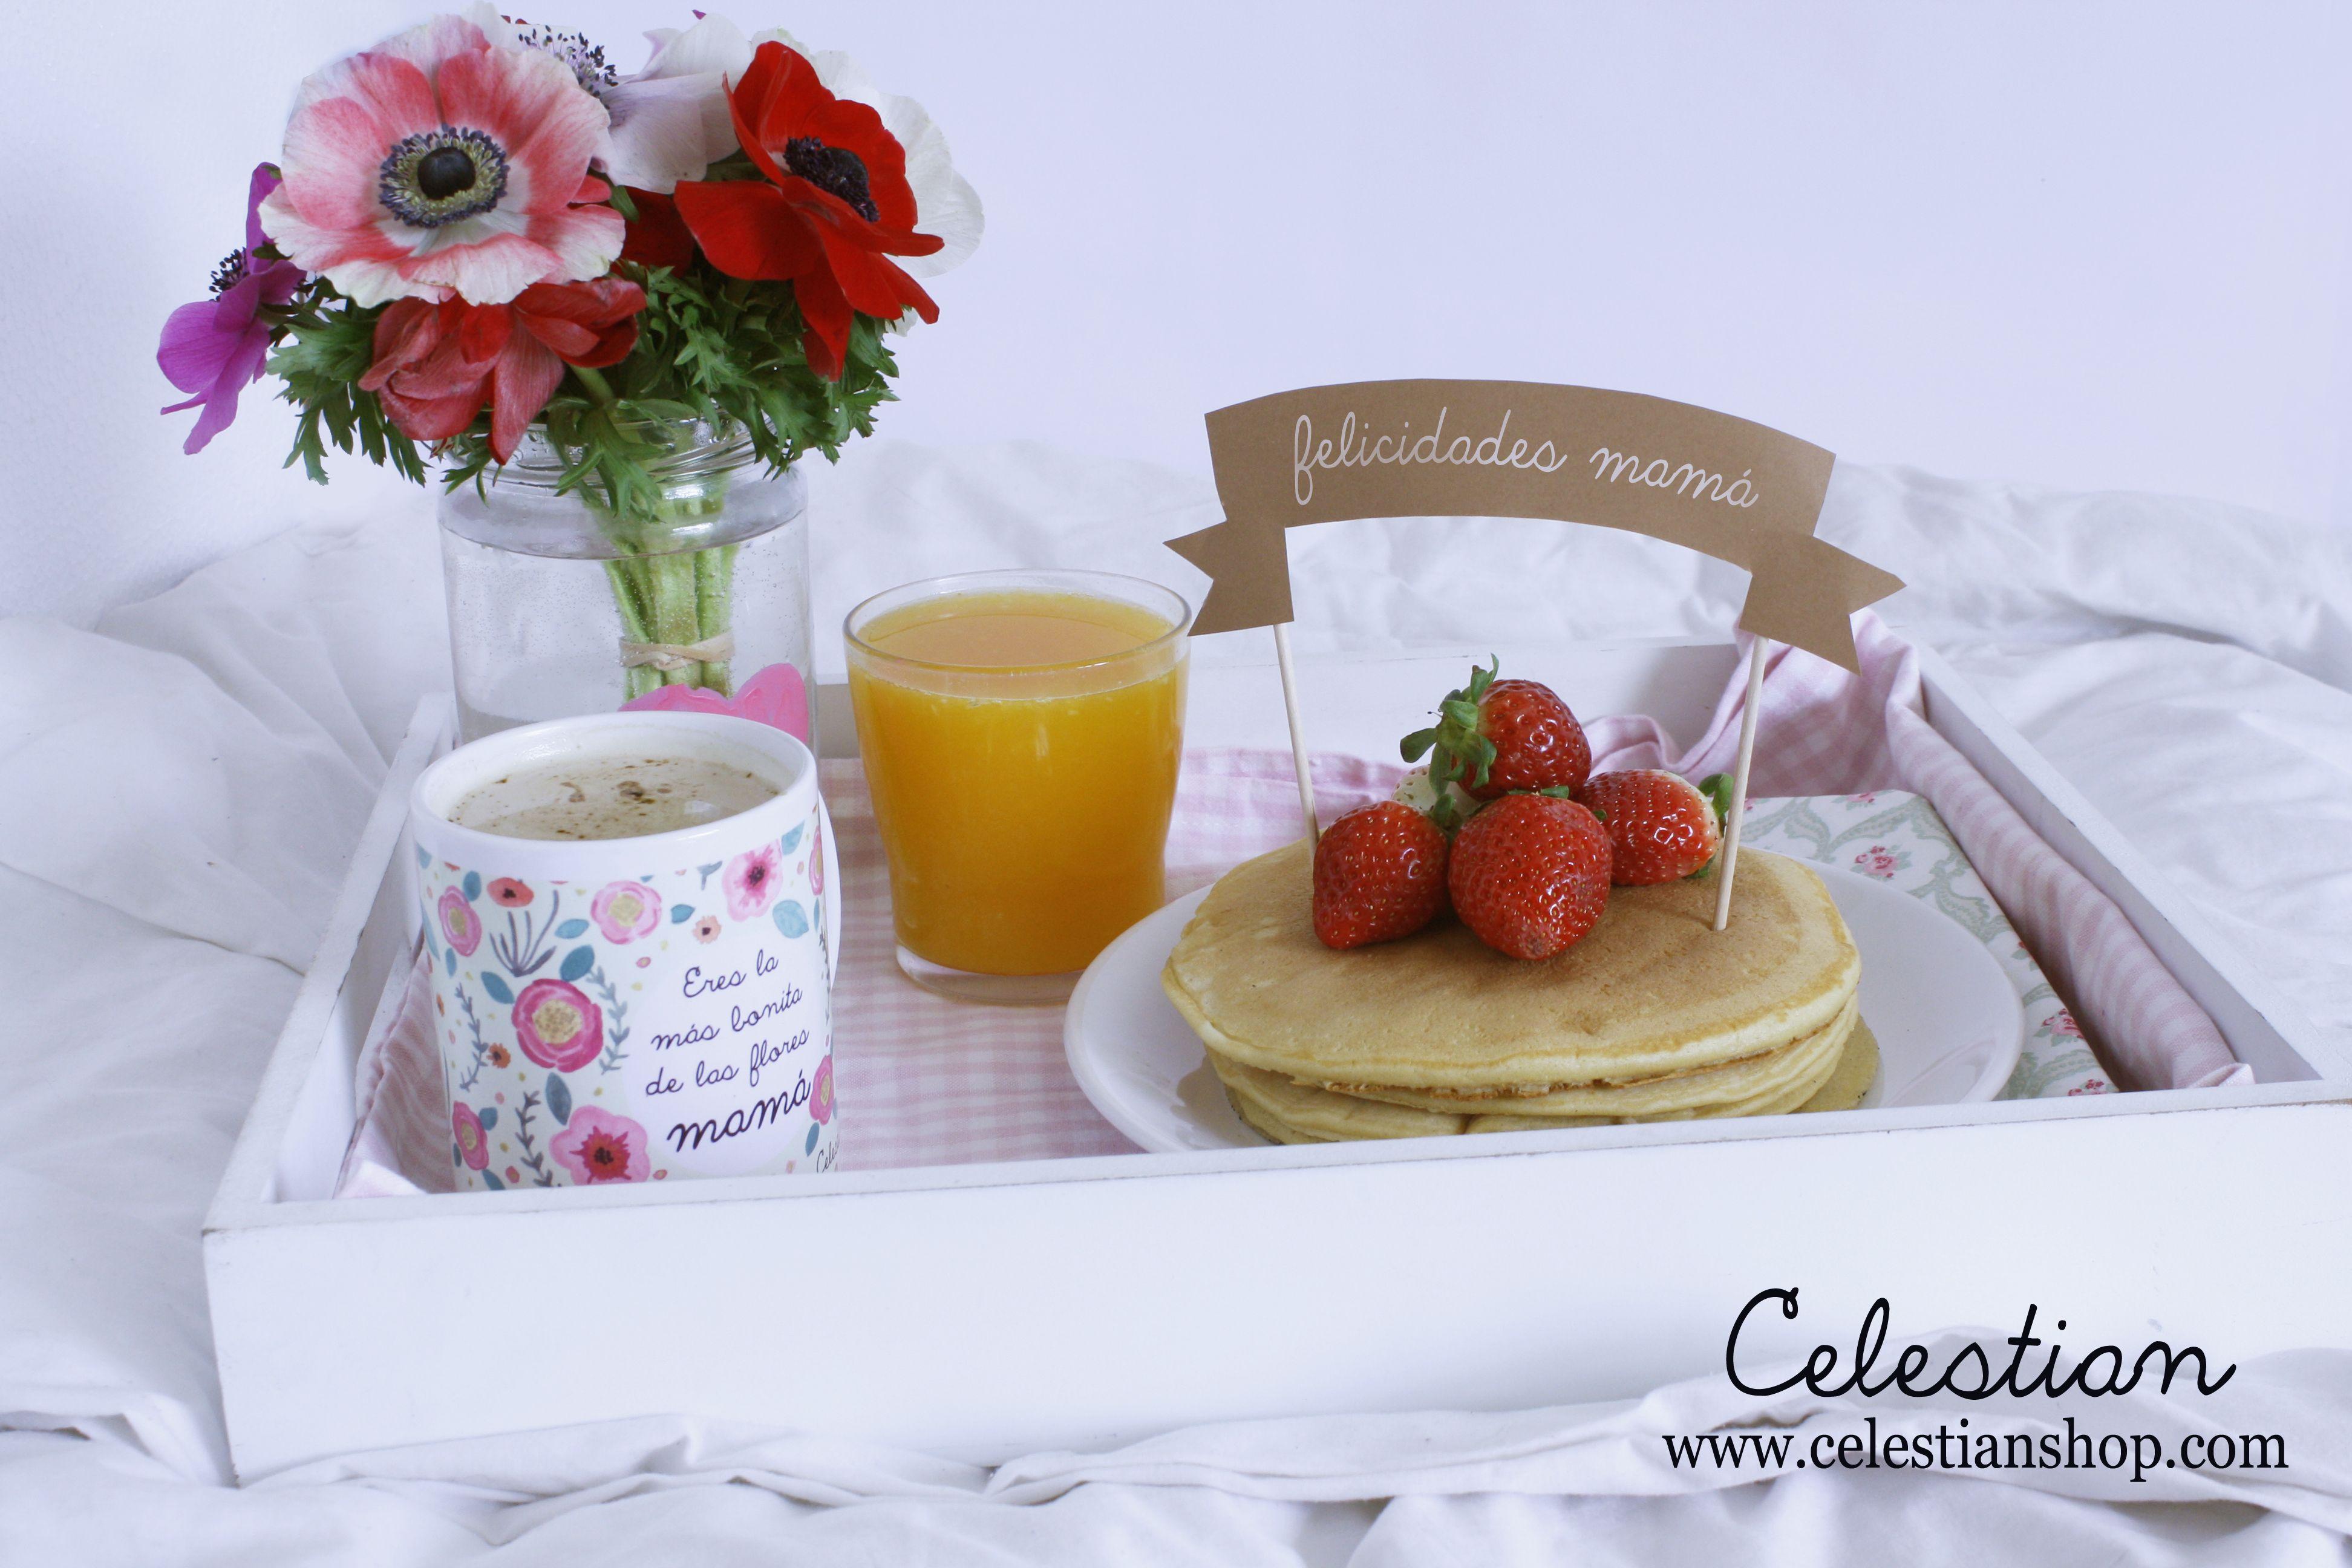 rico desayuno #buenosdias #felizfinde www.celestianshop.com